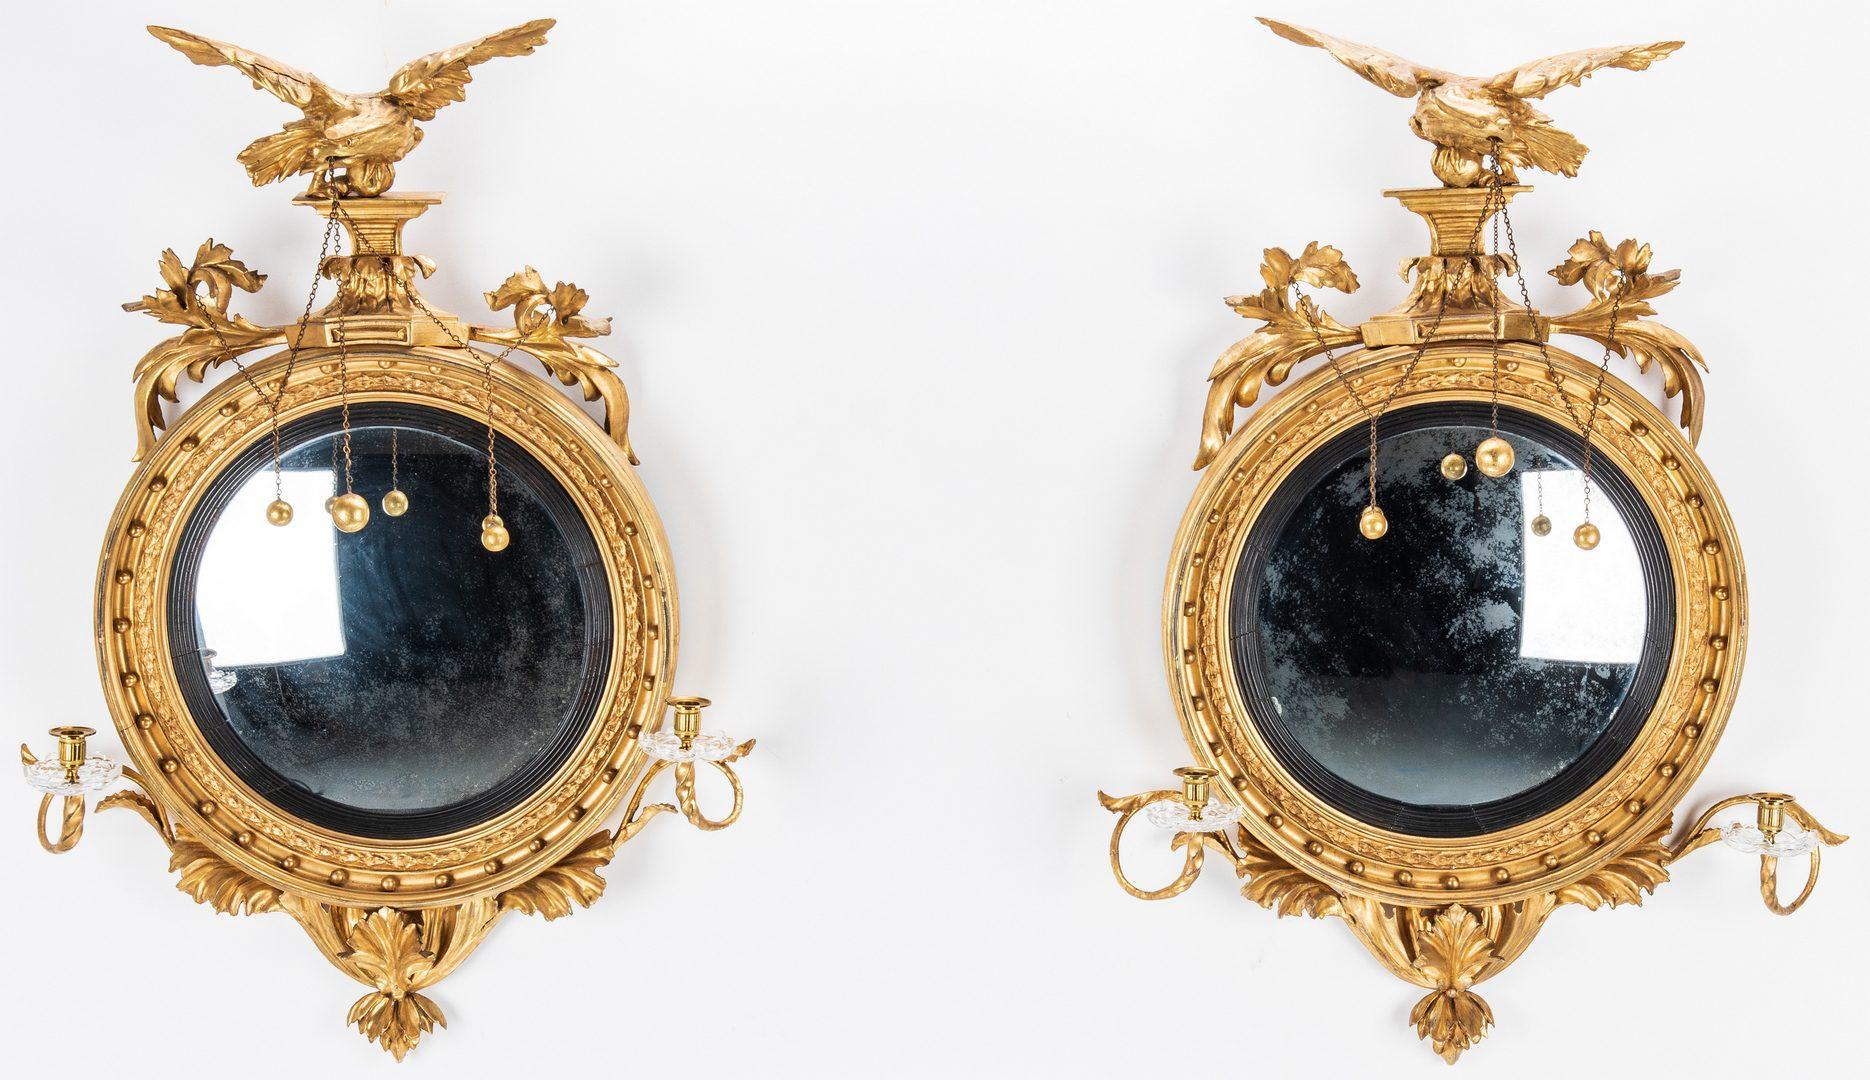 Lot 130: Pair of Federal Period Girandole Mirrors